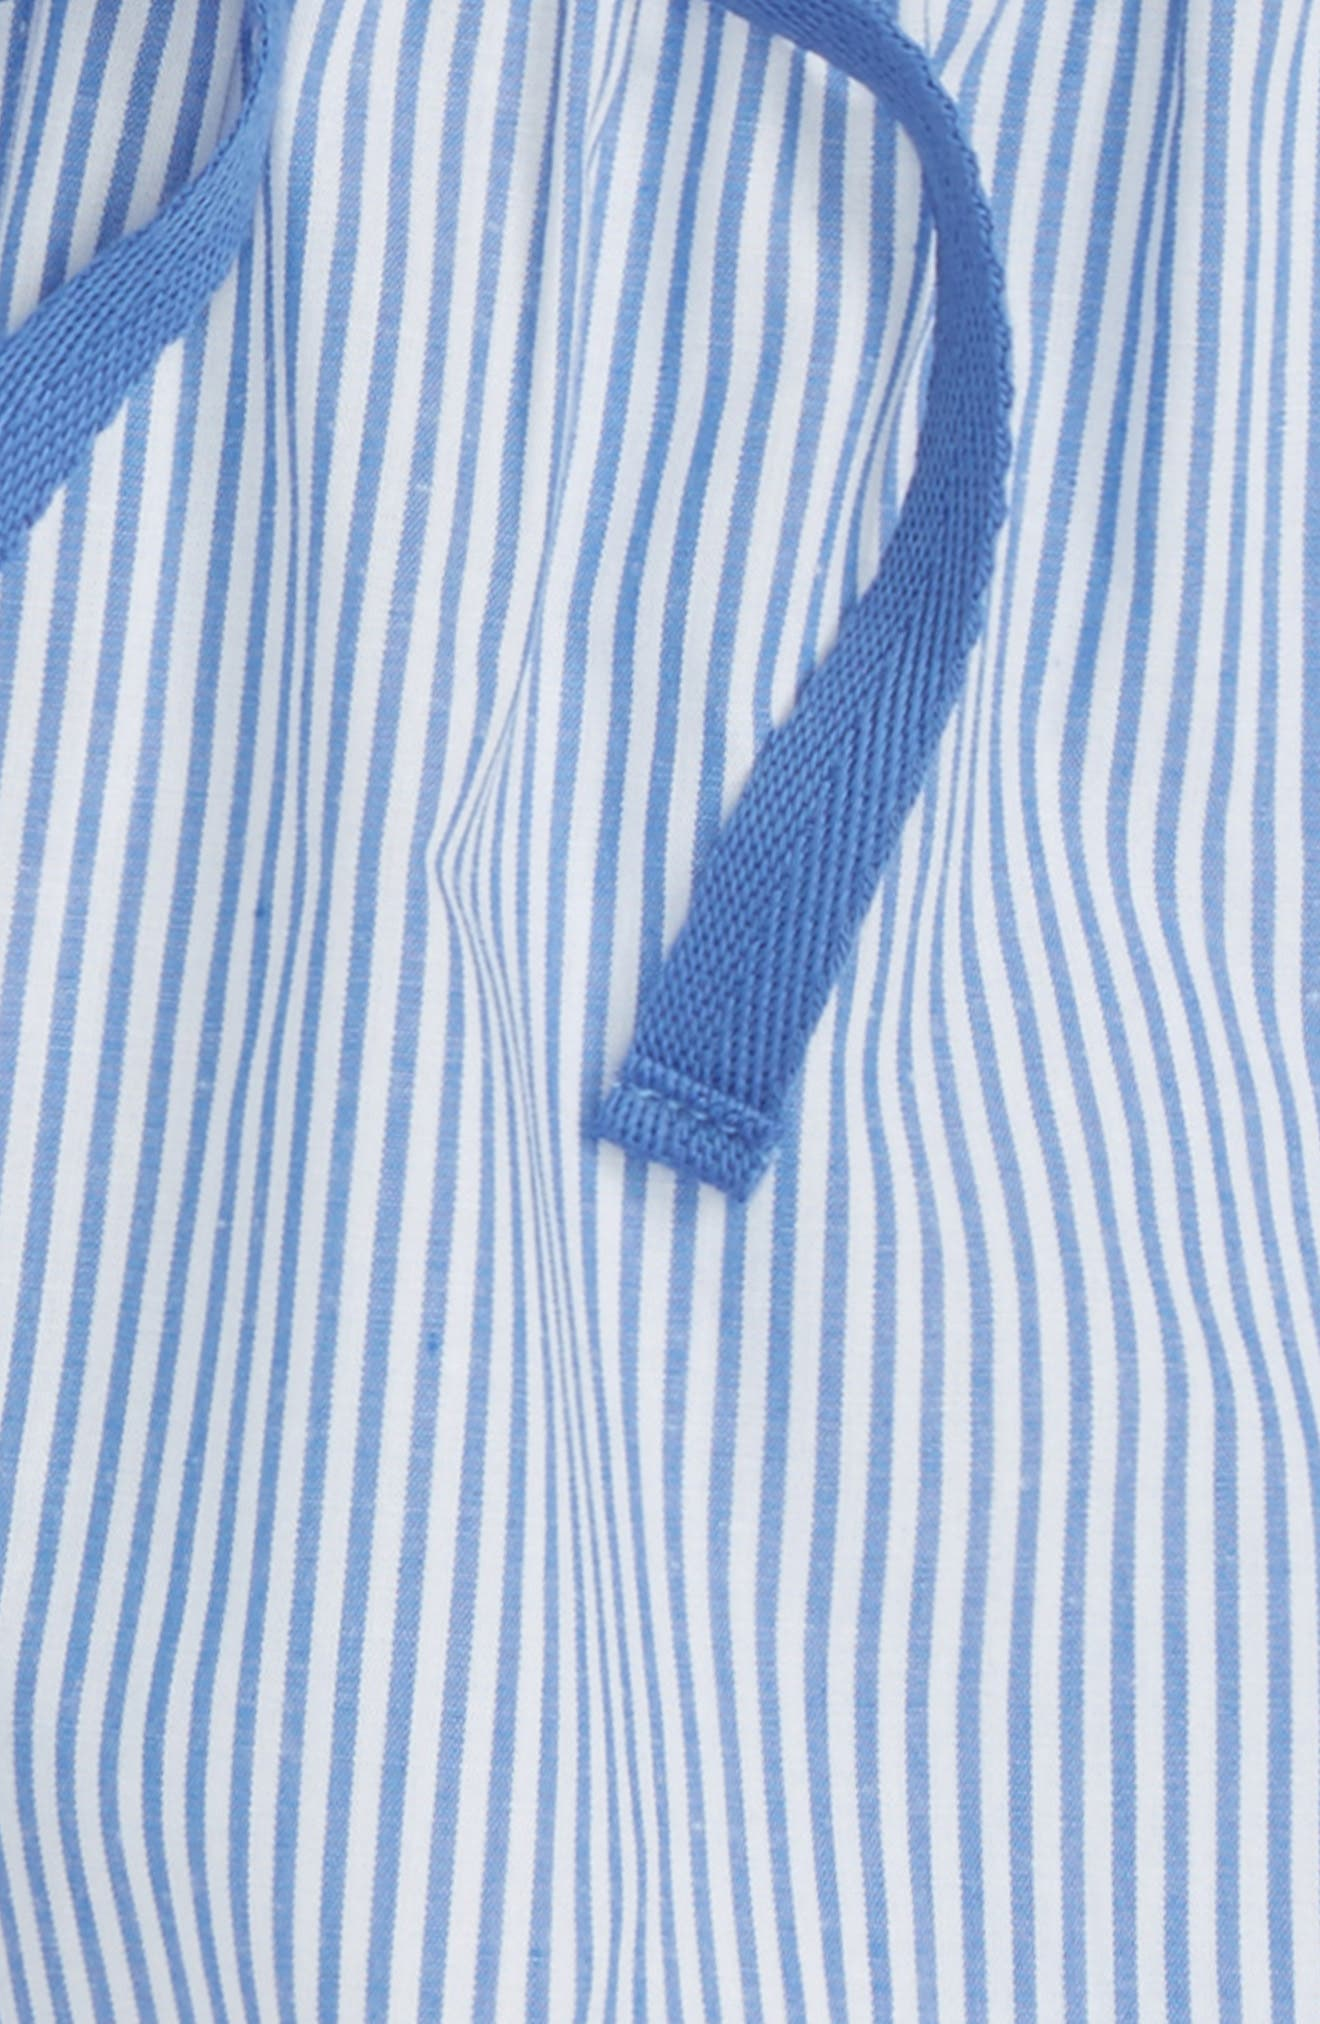 Ruffle Pajama Shorts,                             Alternate thumbnail 2, color,                             100